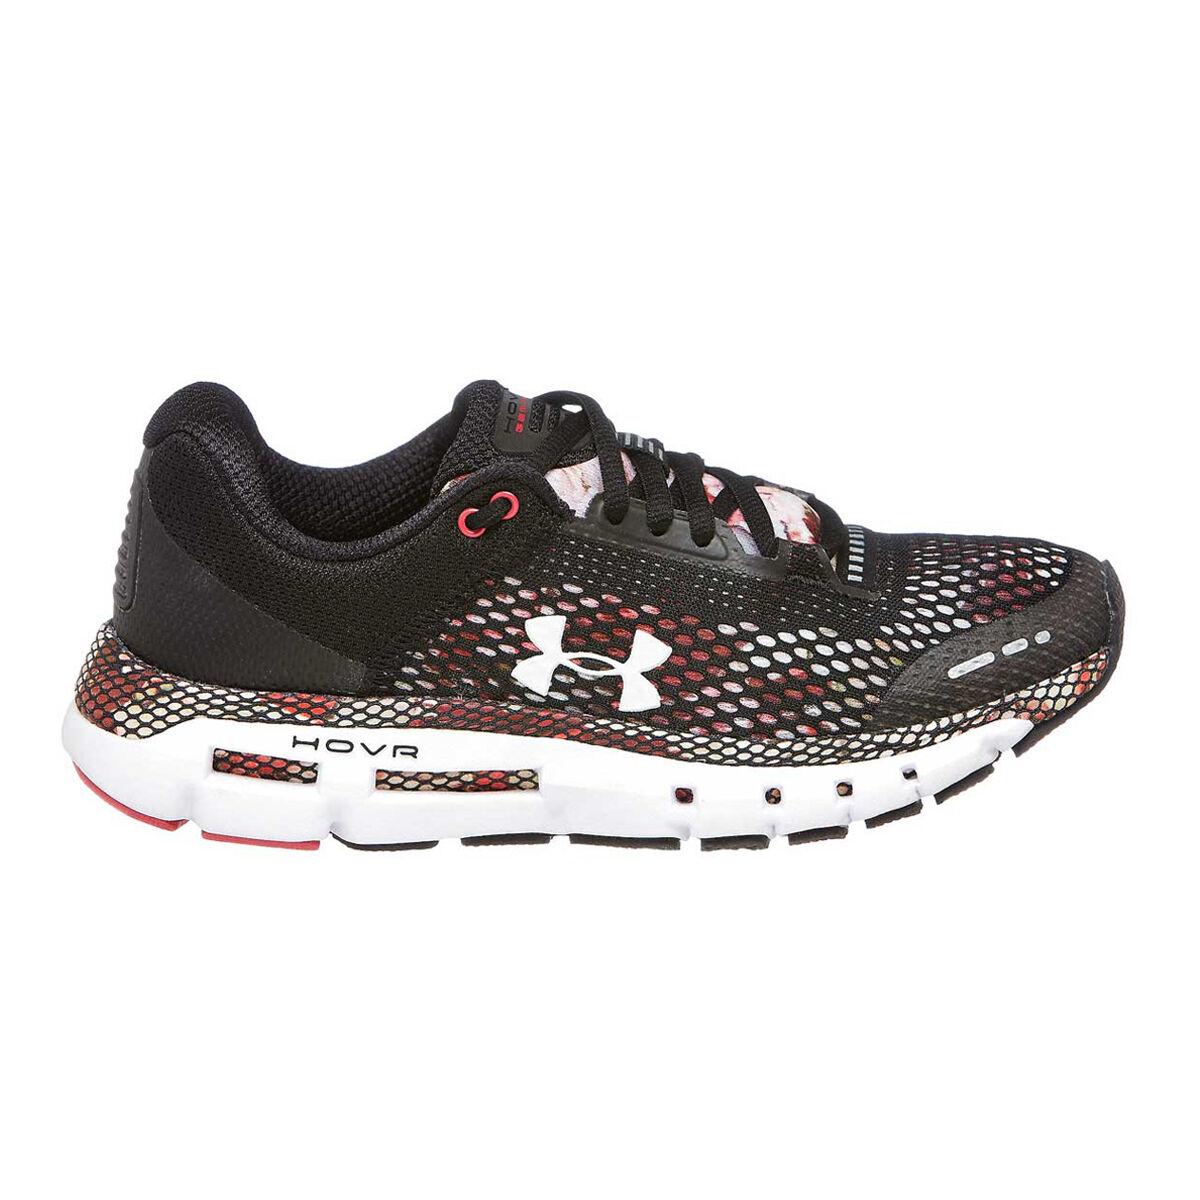 HOVR US Armour Pink Under Shoes SE Black Womens Phantom 6 Running H56qzw 3ce082ec38a